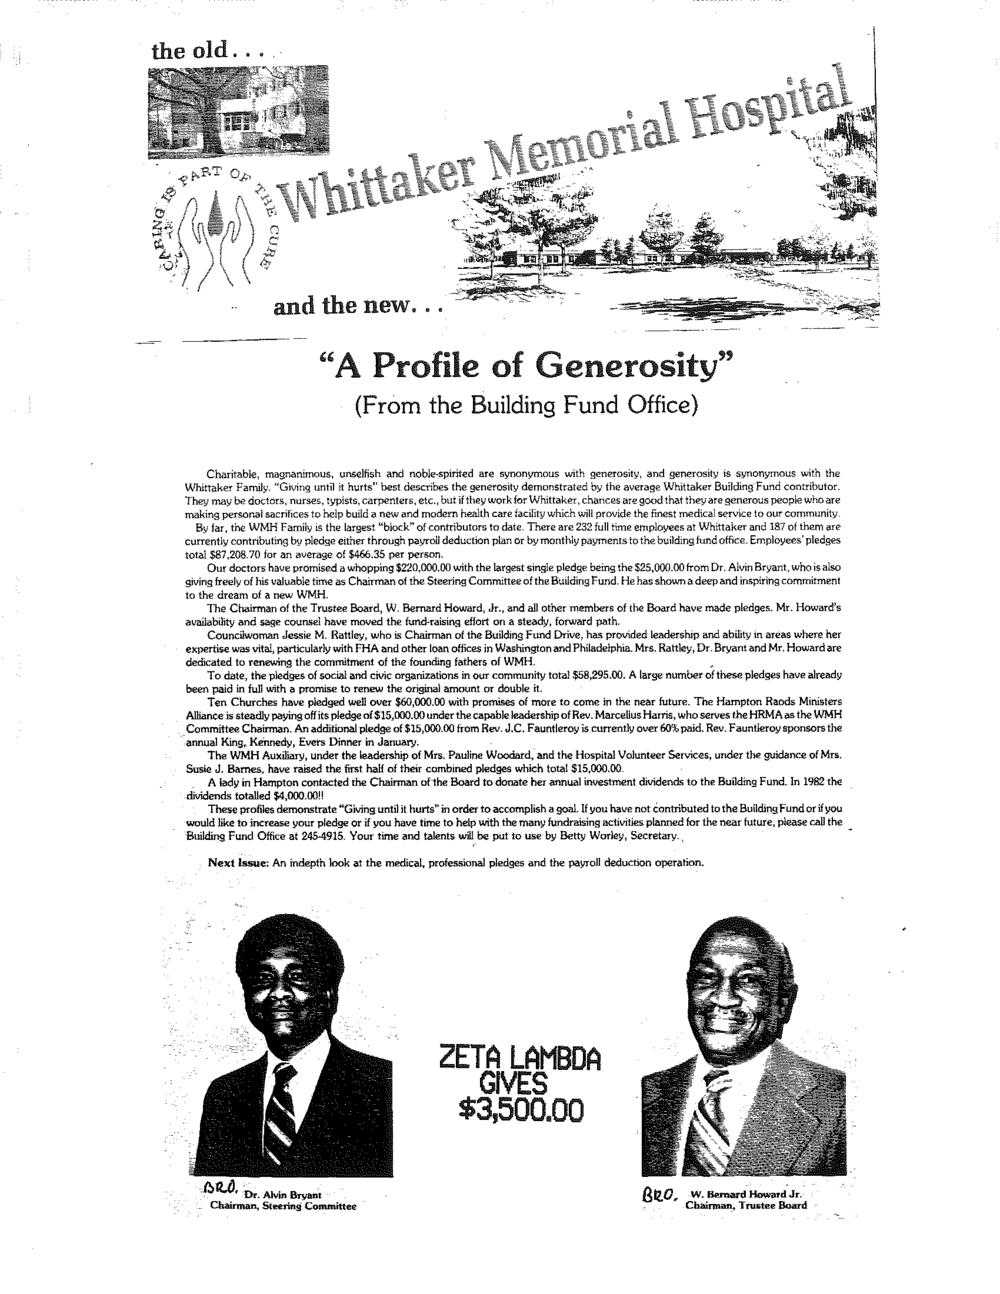 Zeta Lambda 1980s - $3500 to Whittaker Memoral Hospital.png